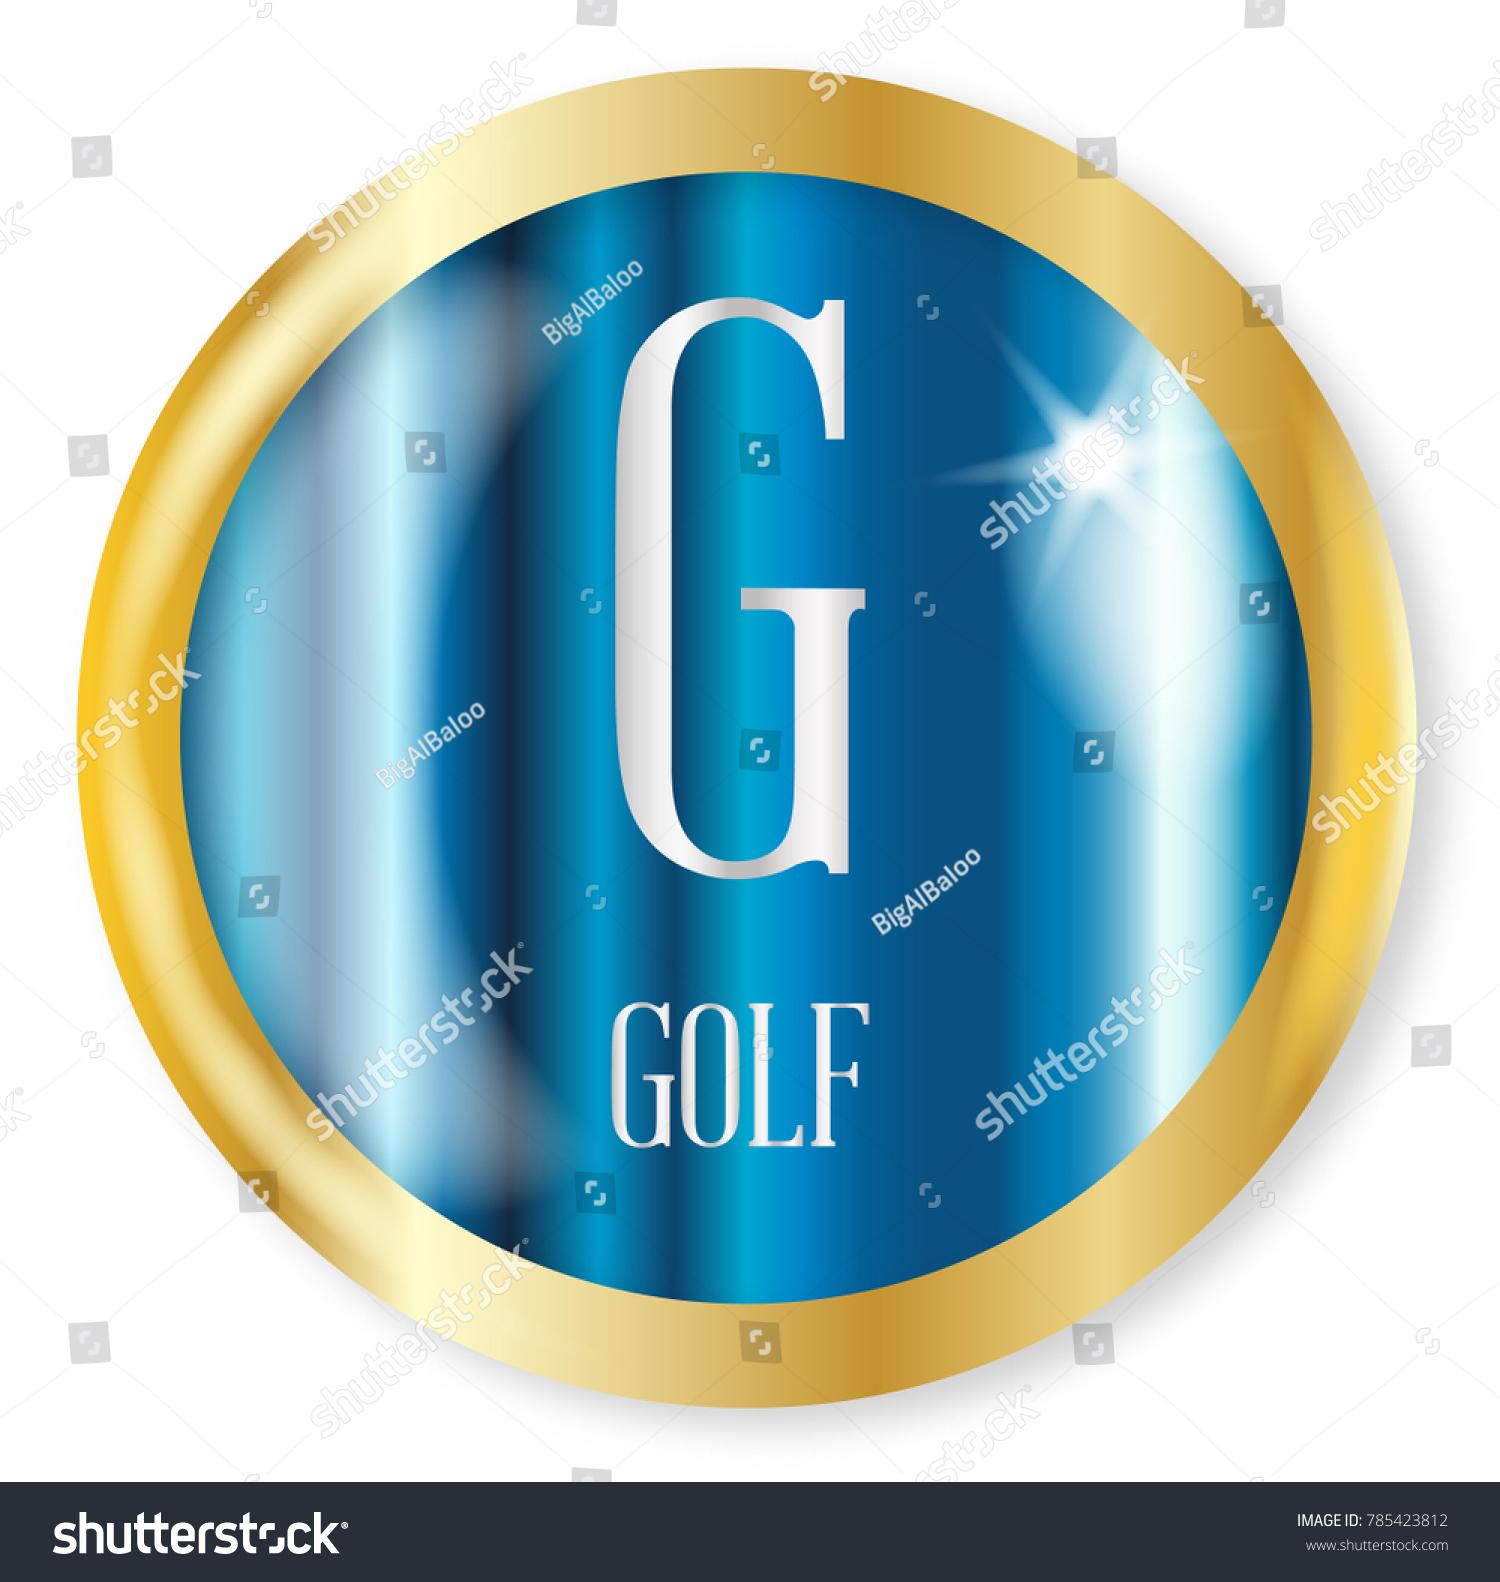 G Golf Button Nato Phonetic Alphabet Stock Illustration 785423812